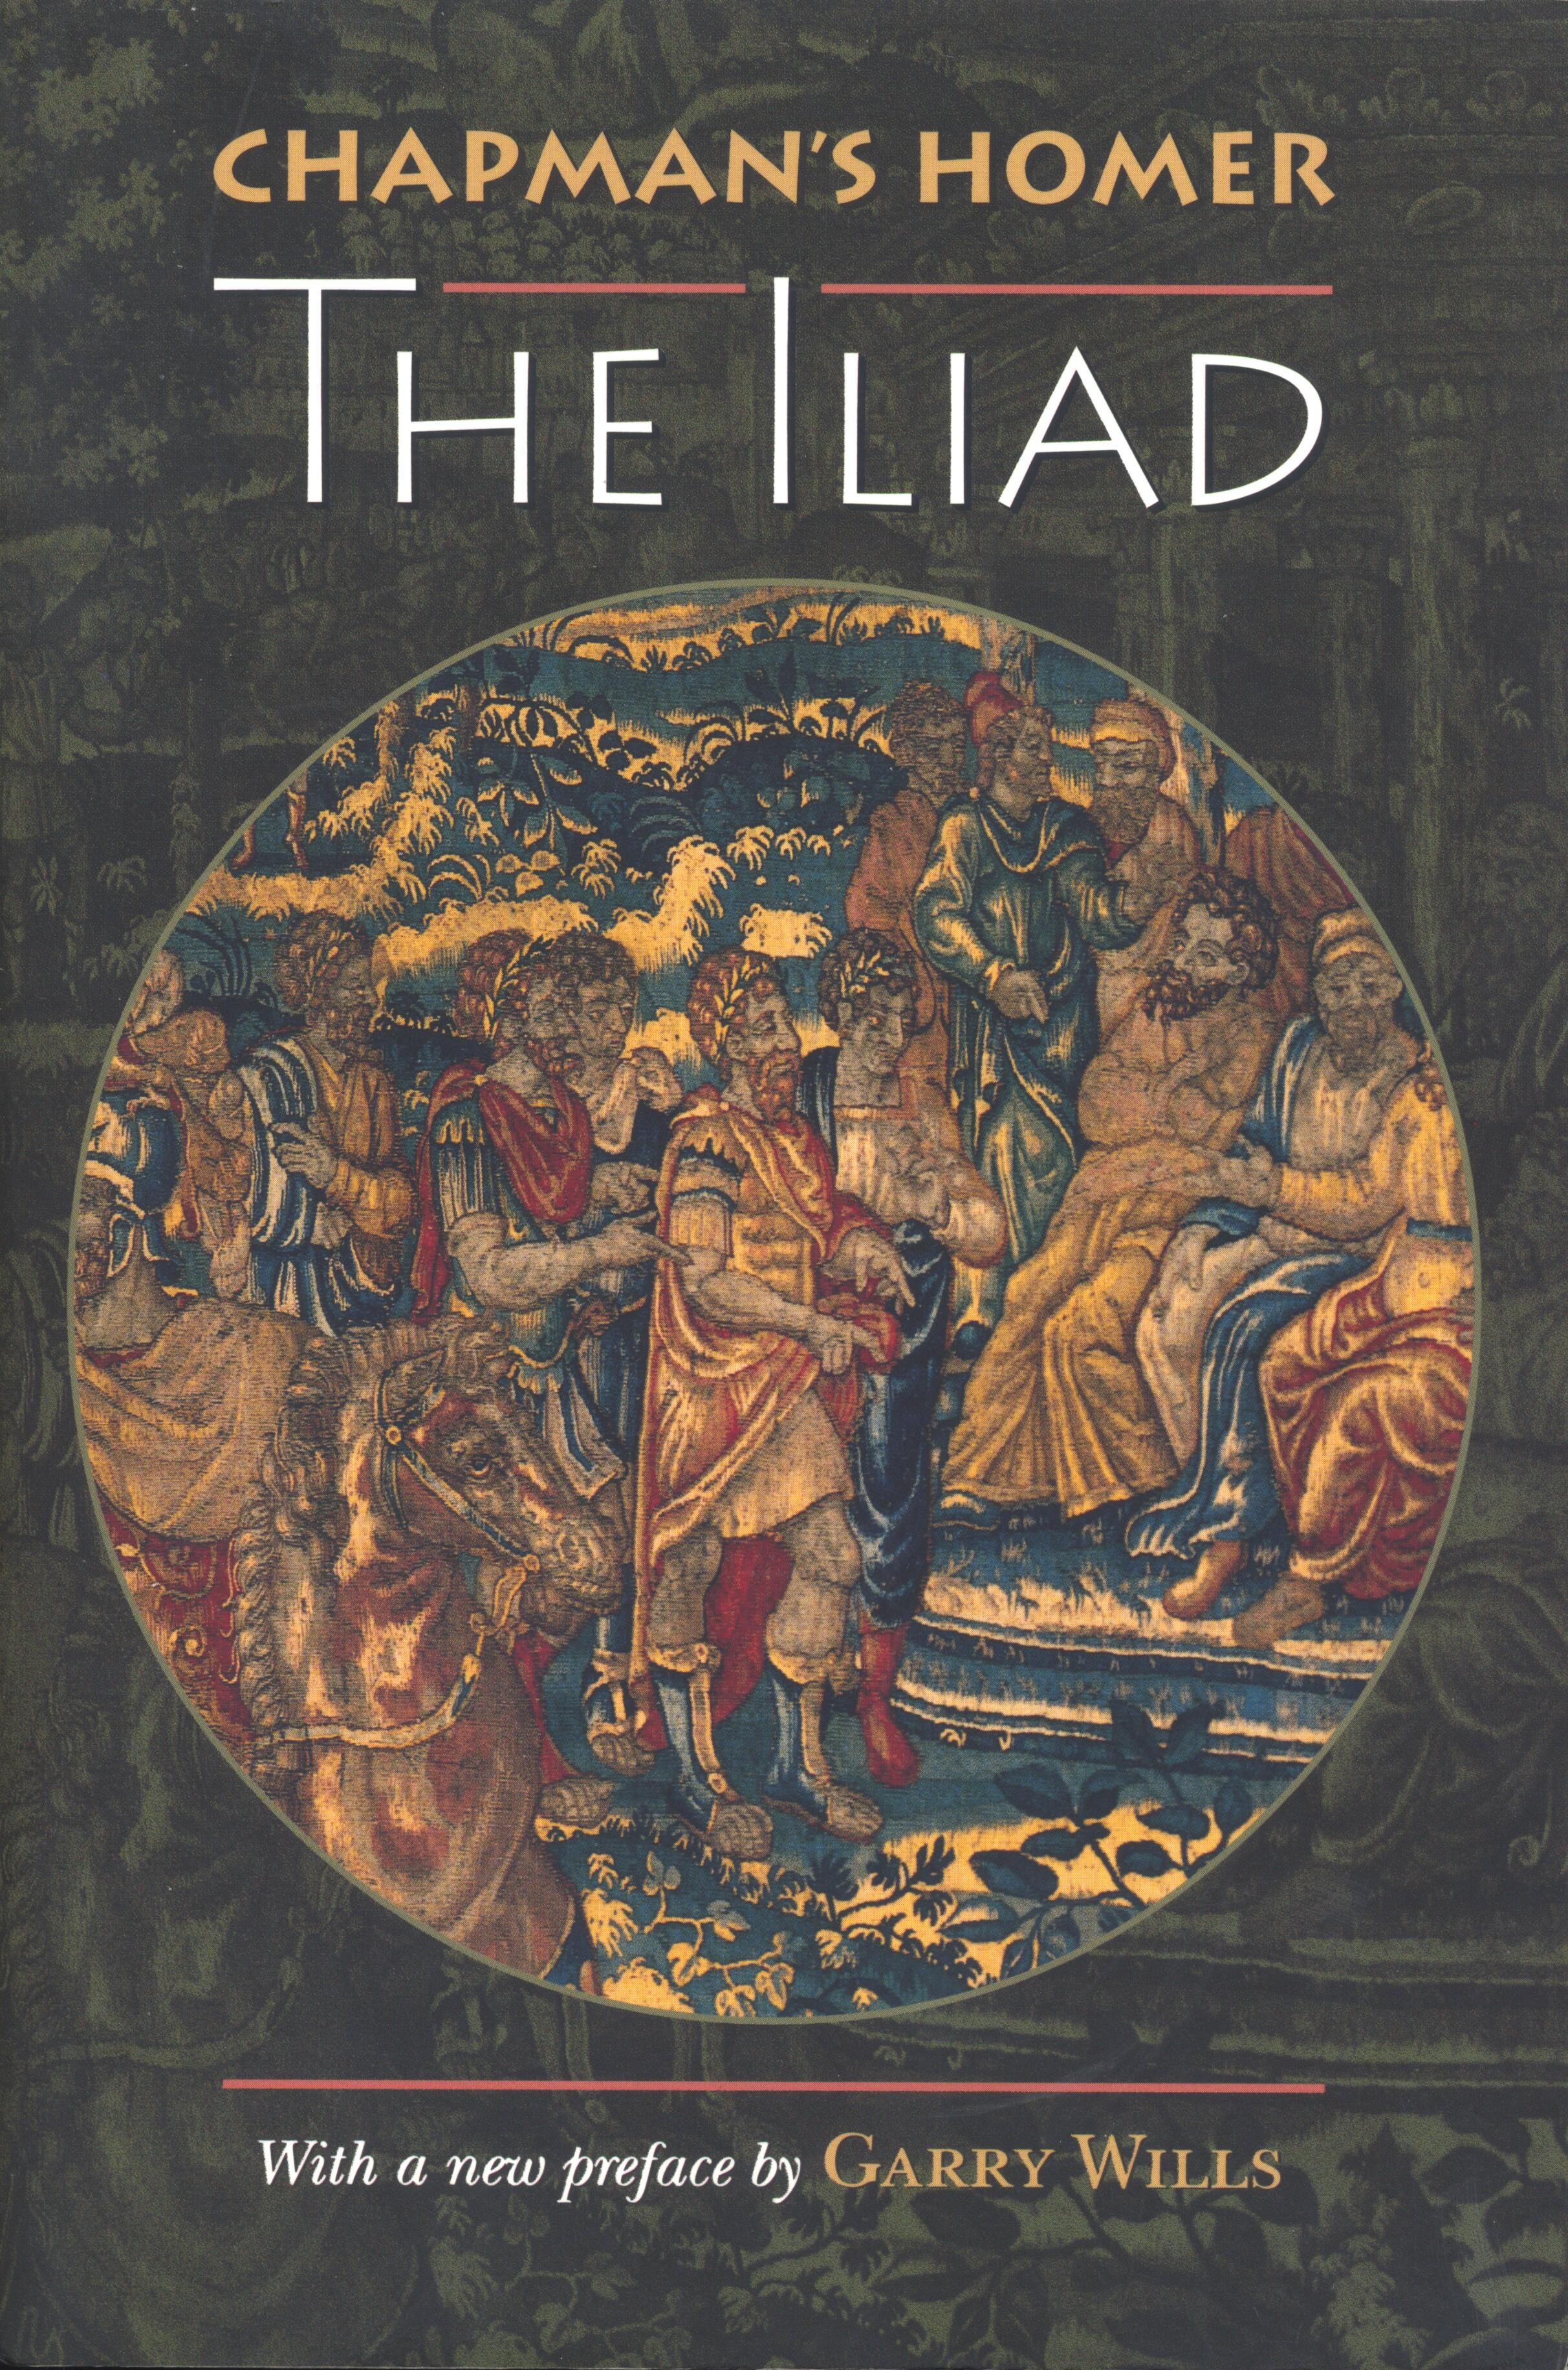 greek gods in the iliad essay